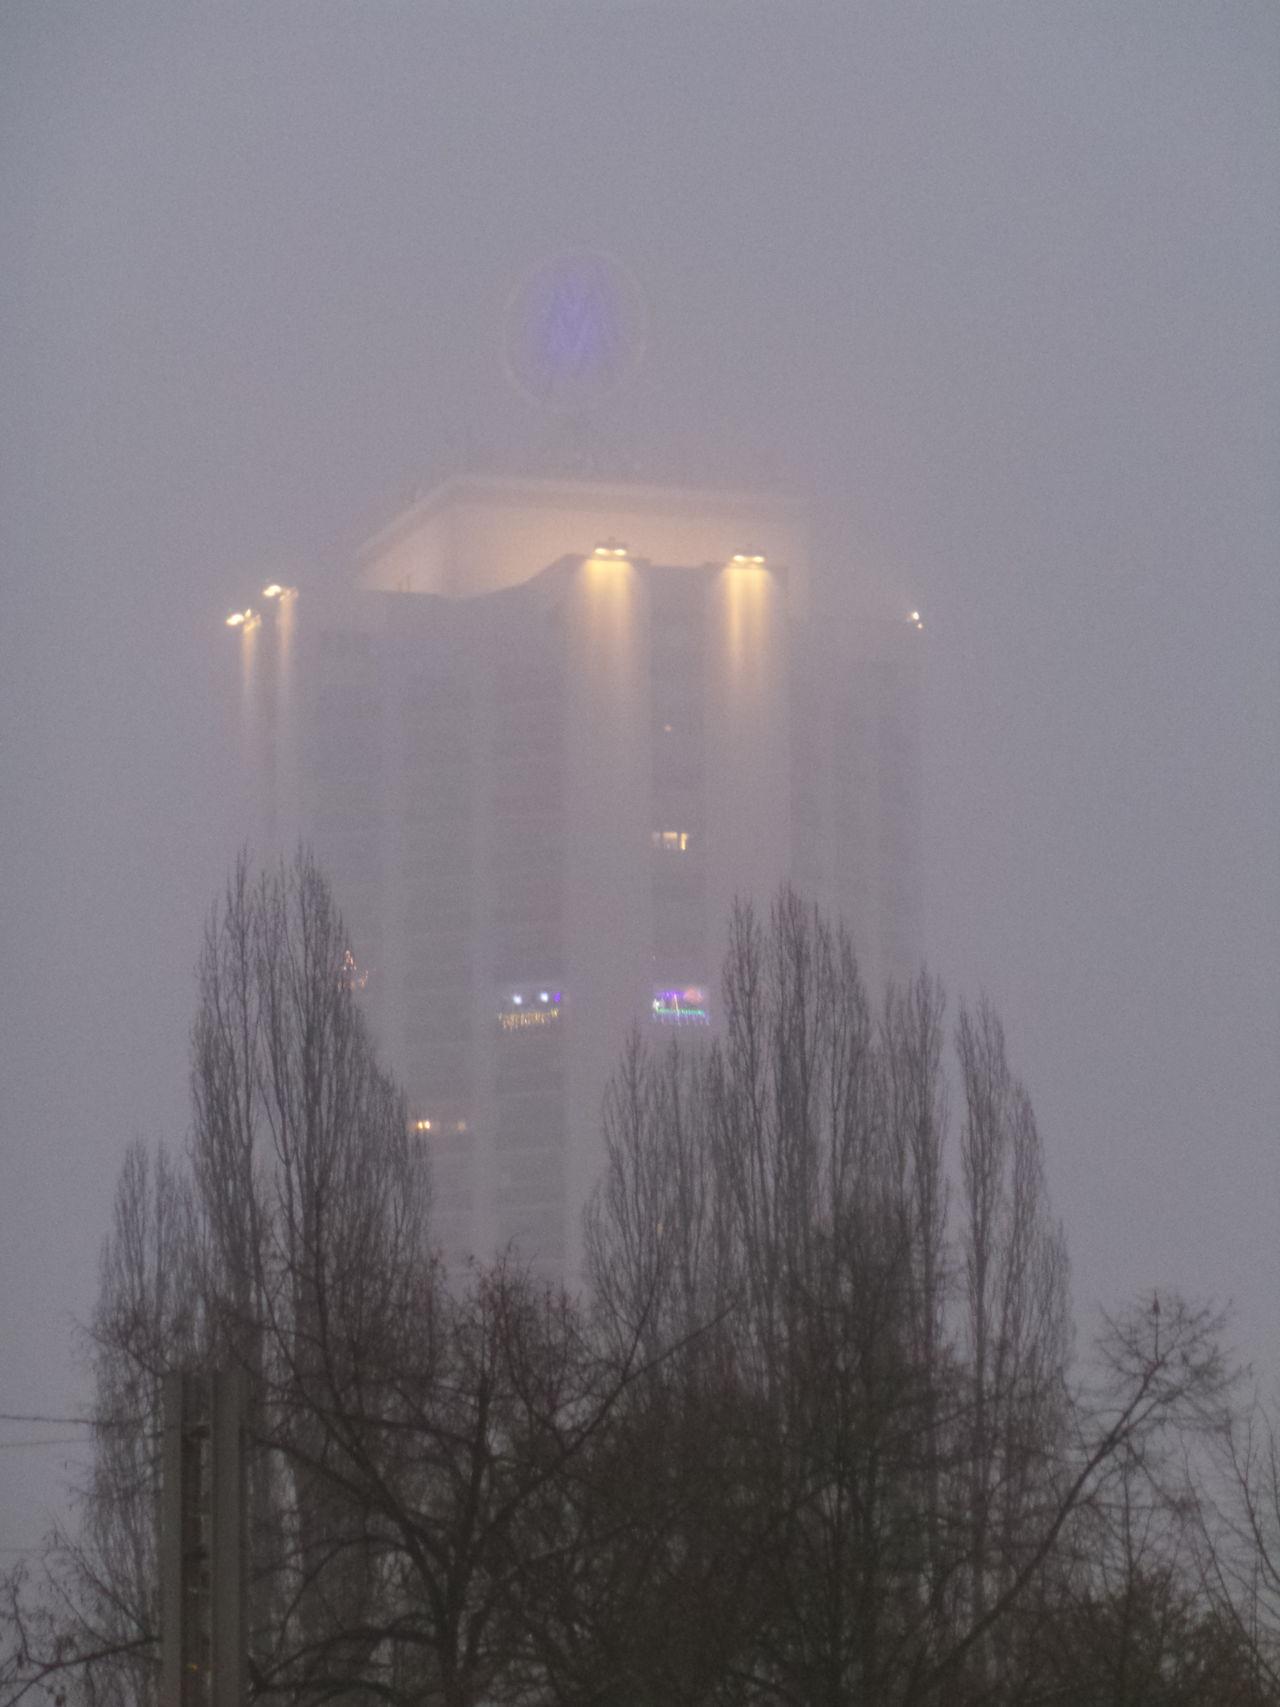 Wintergartenhochhaus bei Nebel Bäume Foggy High-rise Building Hochhaus Leipzig Nebelig Trees Winter Wintergartenhochhaus UFO